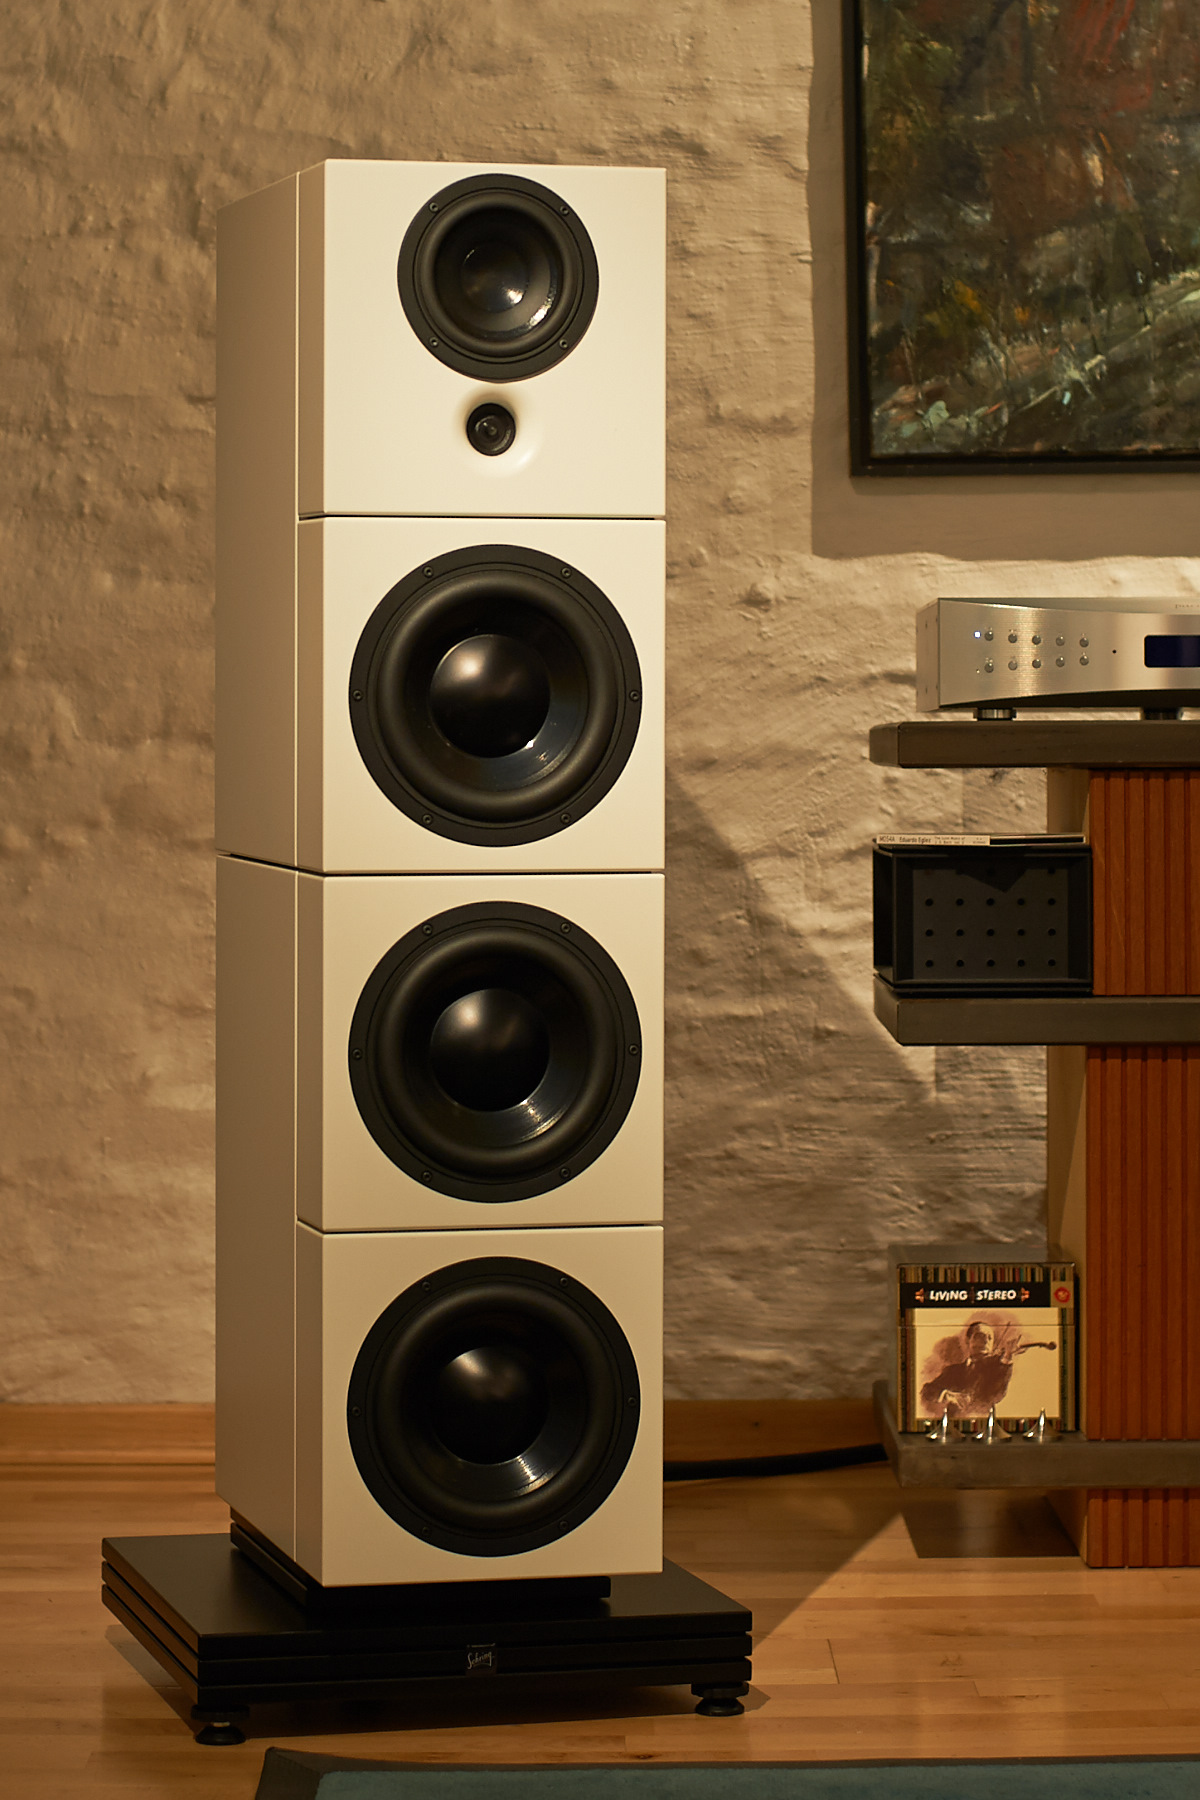 Sehring Audio Systeme Serie 900, Modell 903 B, Mittel-Hochtonmodul Standardposition